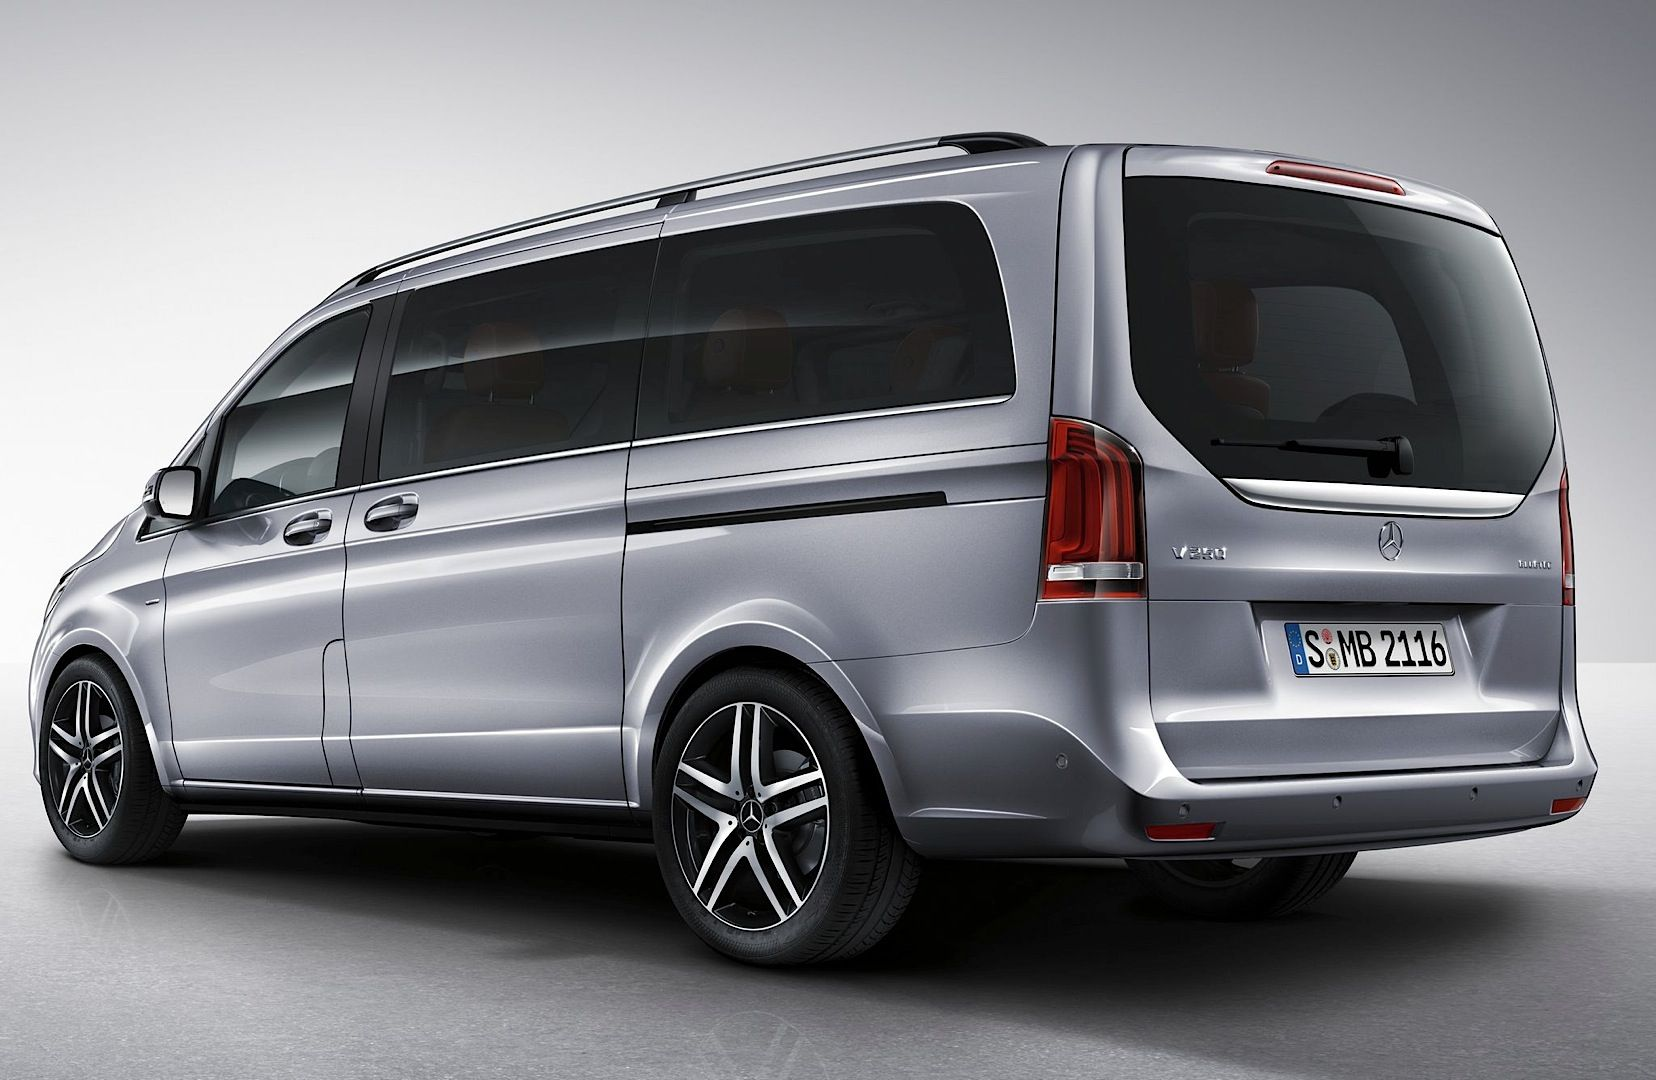 Business group glm vip limousine transfers mercedes benz viano minivan campers minivan conversions pinterest mercedes benz viano minivan and